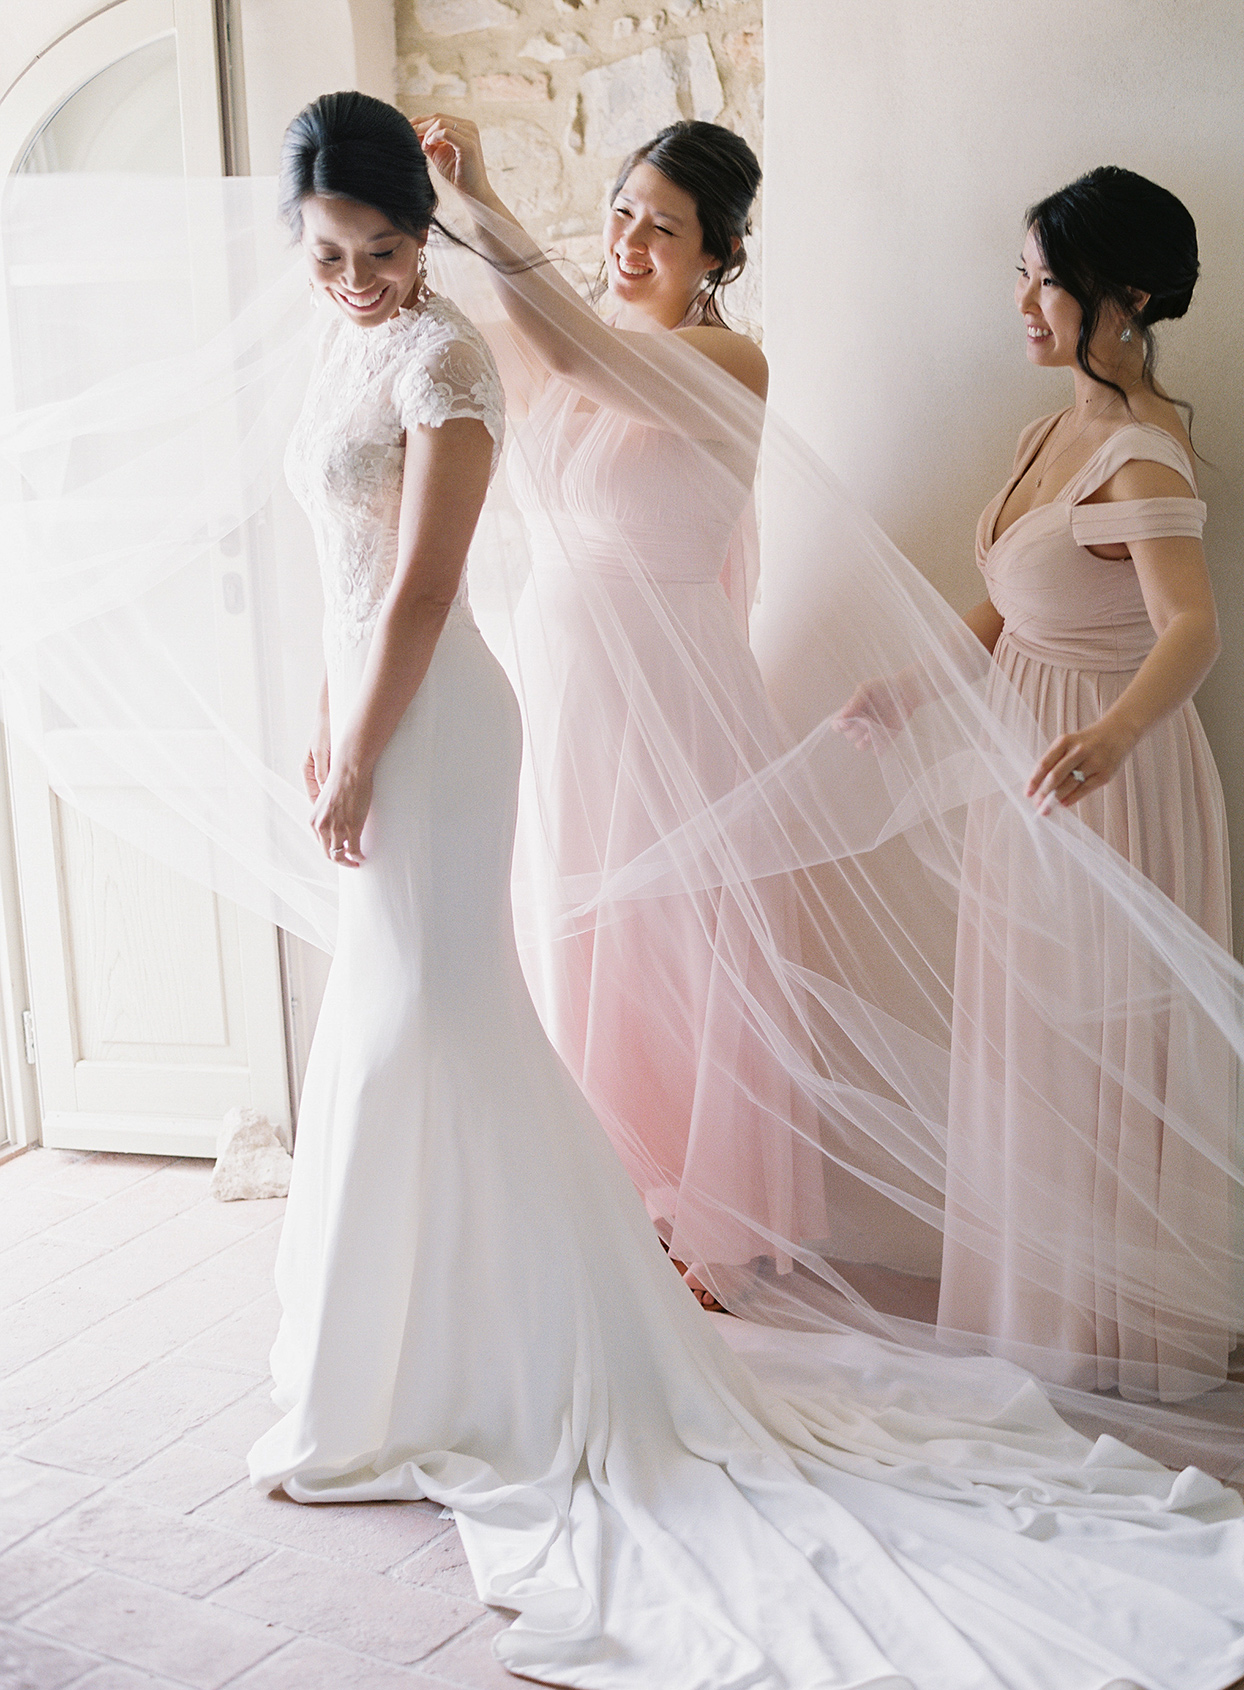 jen alan wedding bride getting ready with bridesmaids